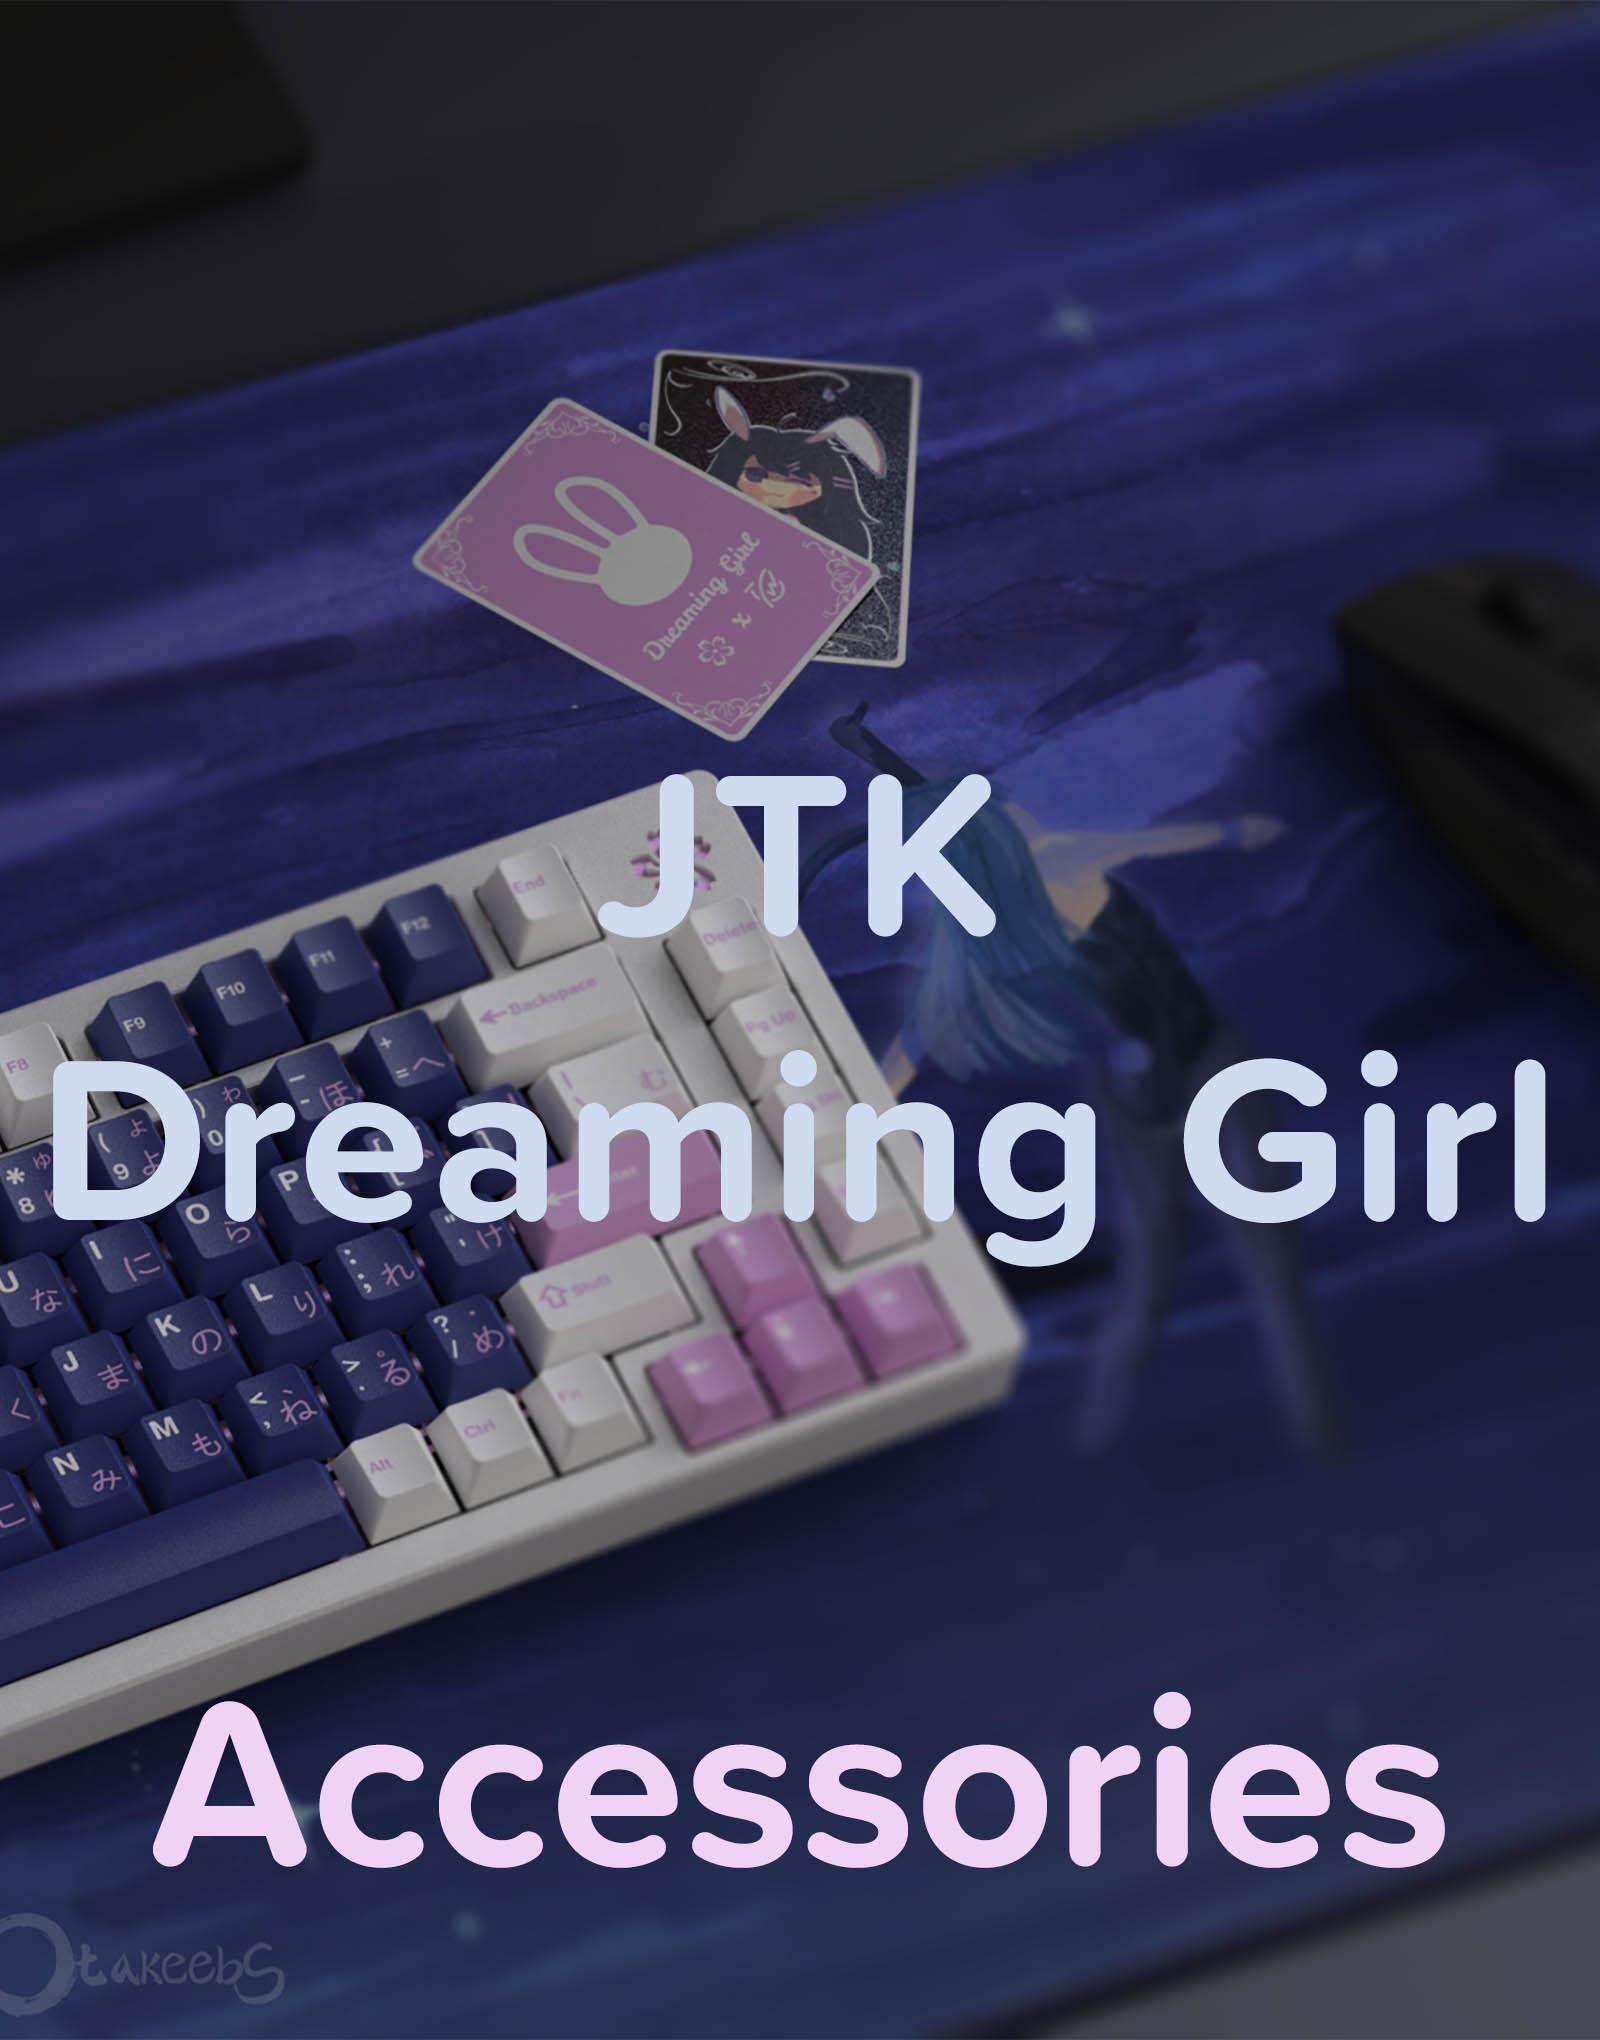 JTK Dreaming Girl Accessories